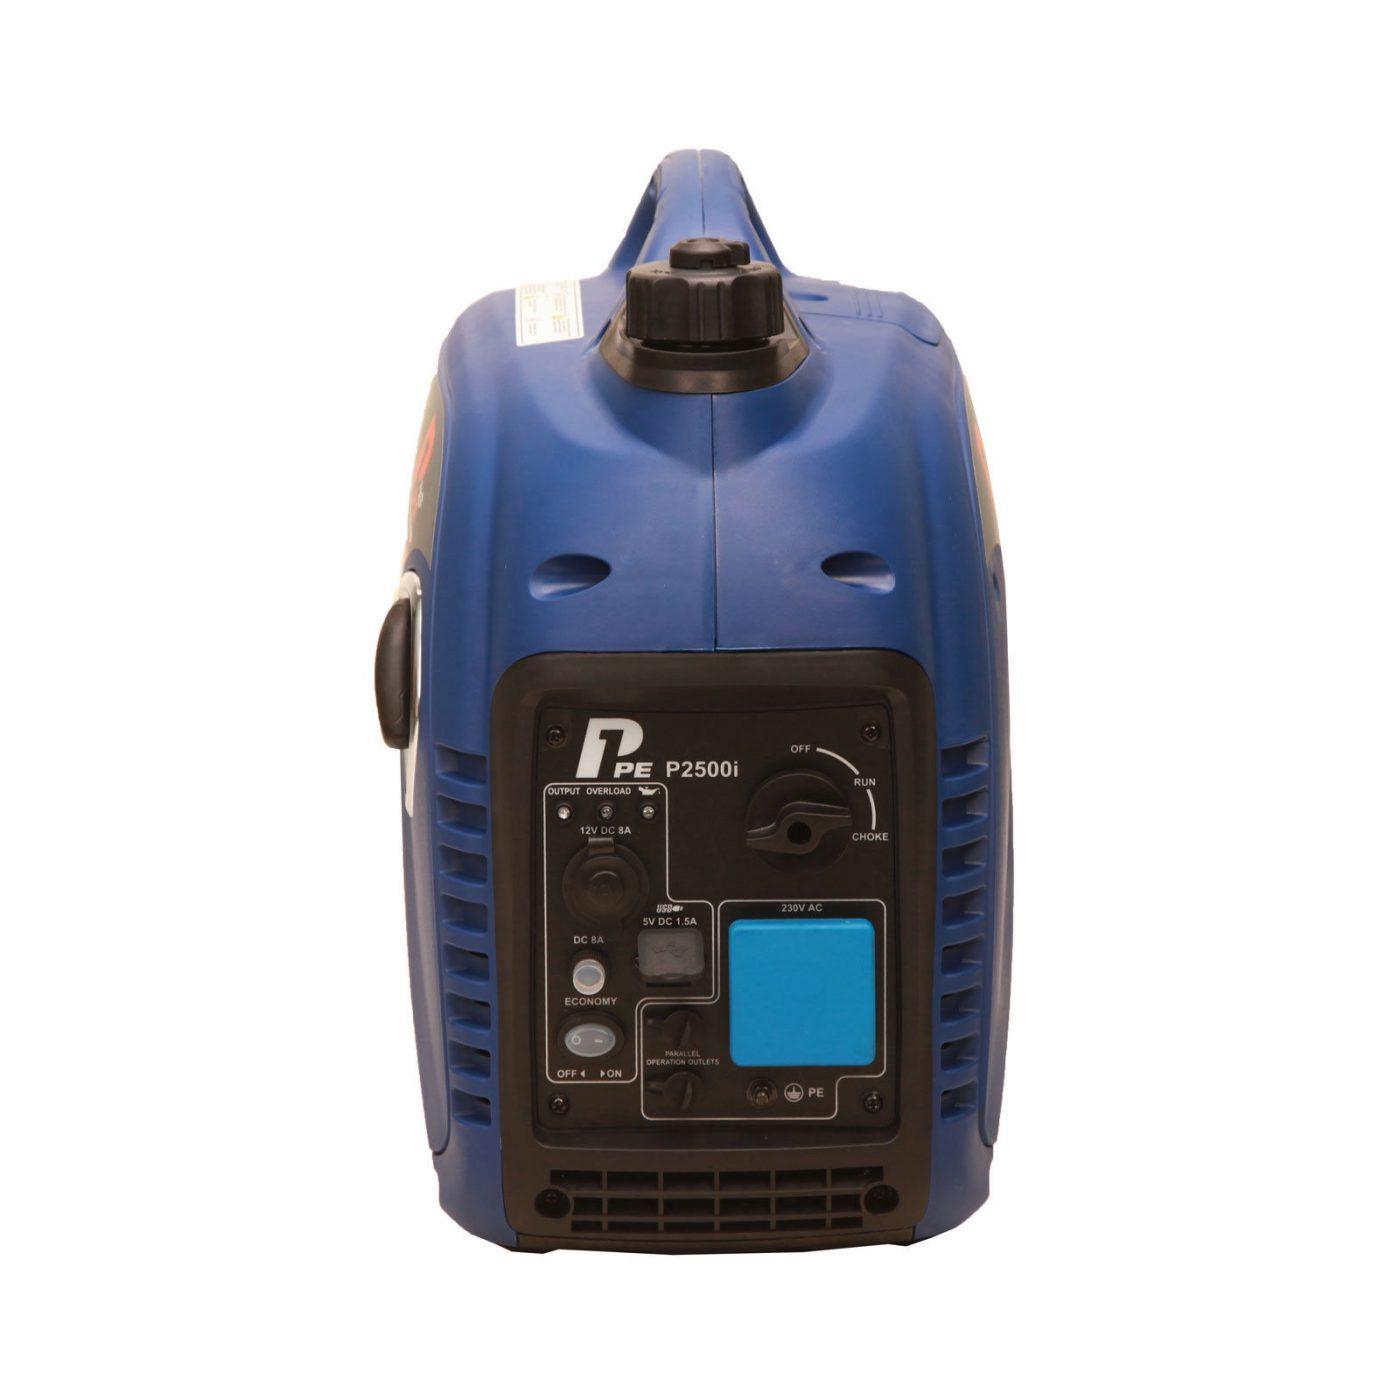 P2500i P1PE 2200W Petrol Inverter Generator Powered by Hyundai